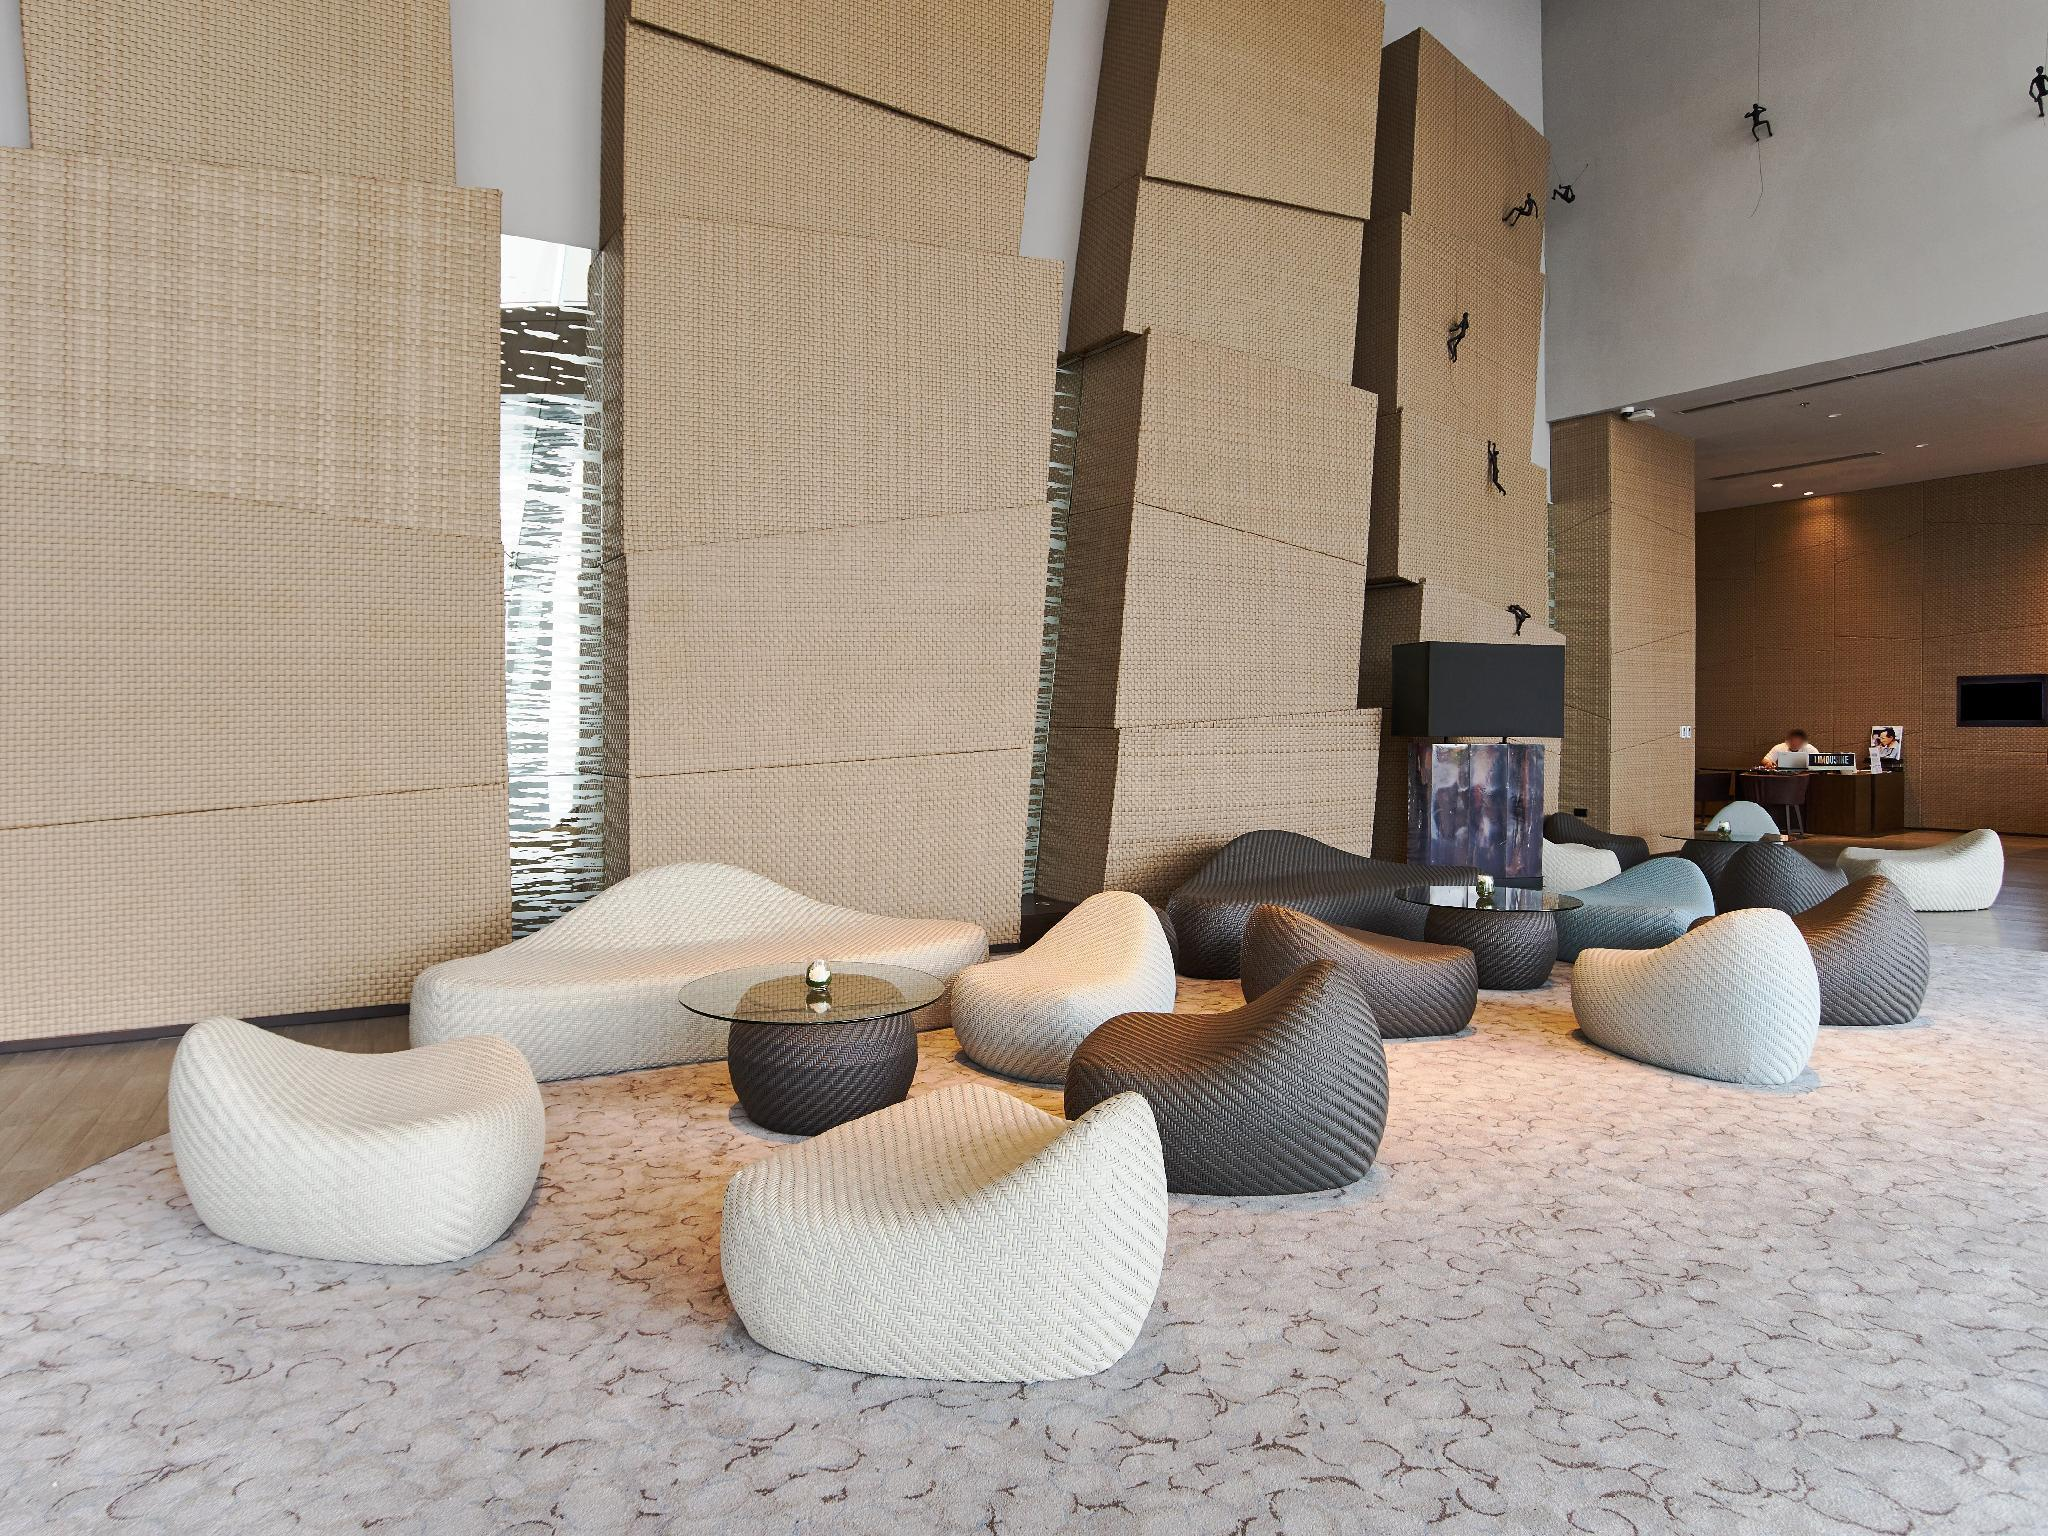 Movenpick Siam Hotel Na Jomtien Pattaya Thailand Mulai Dari